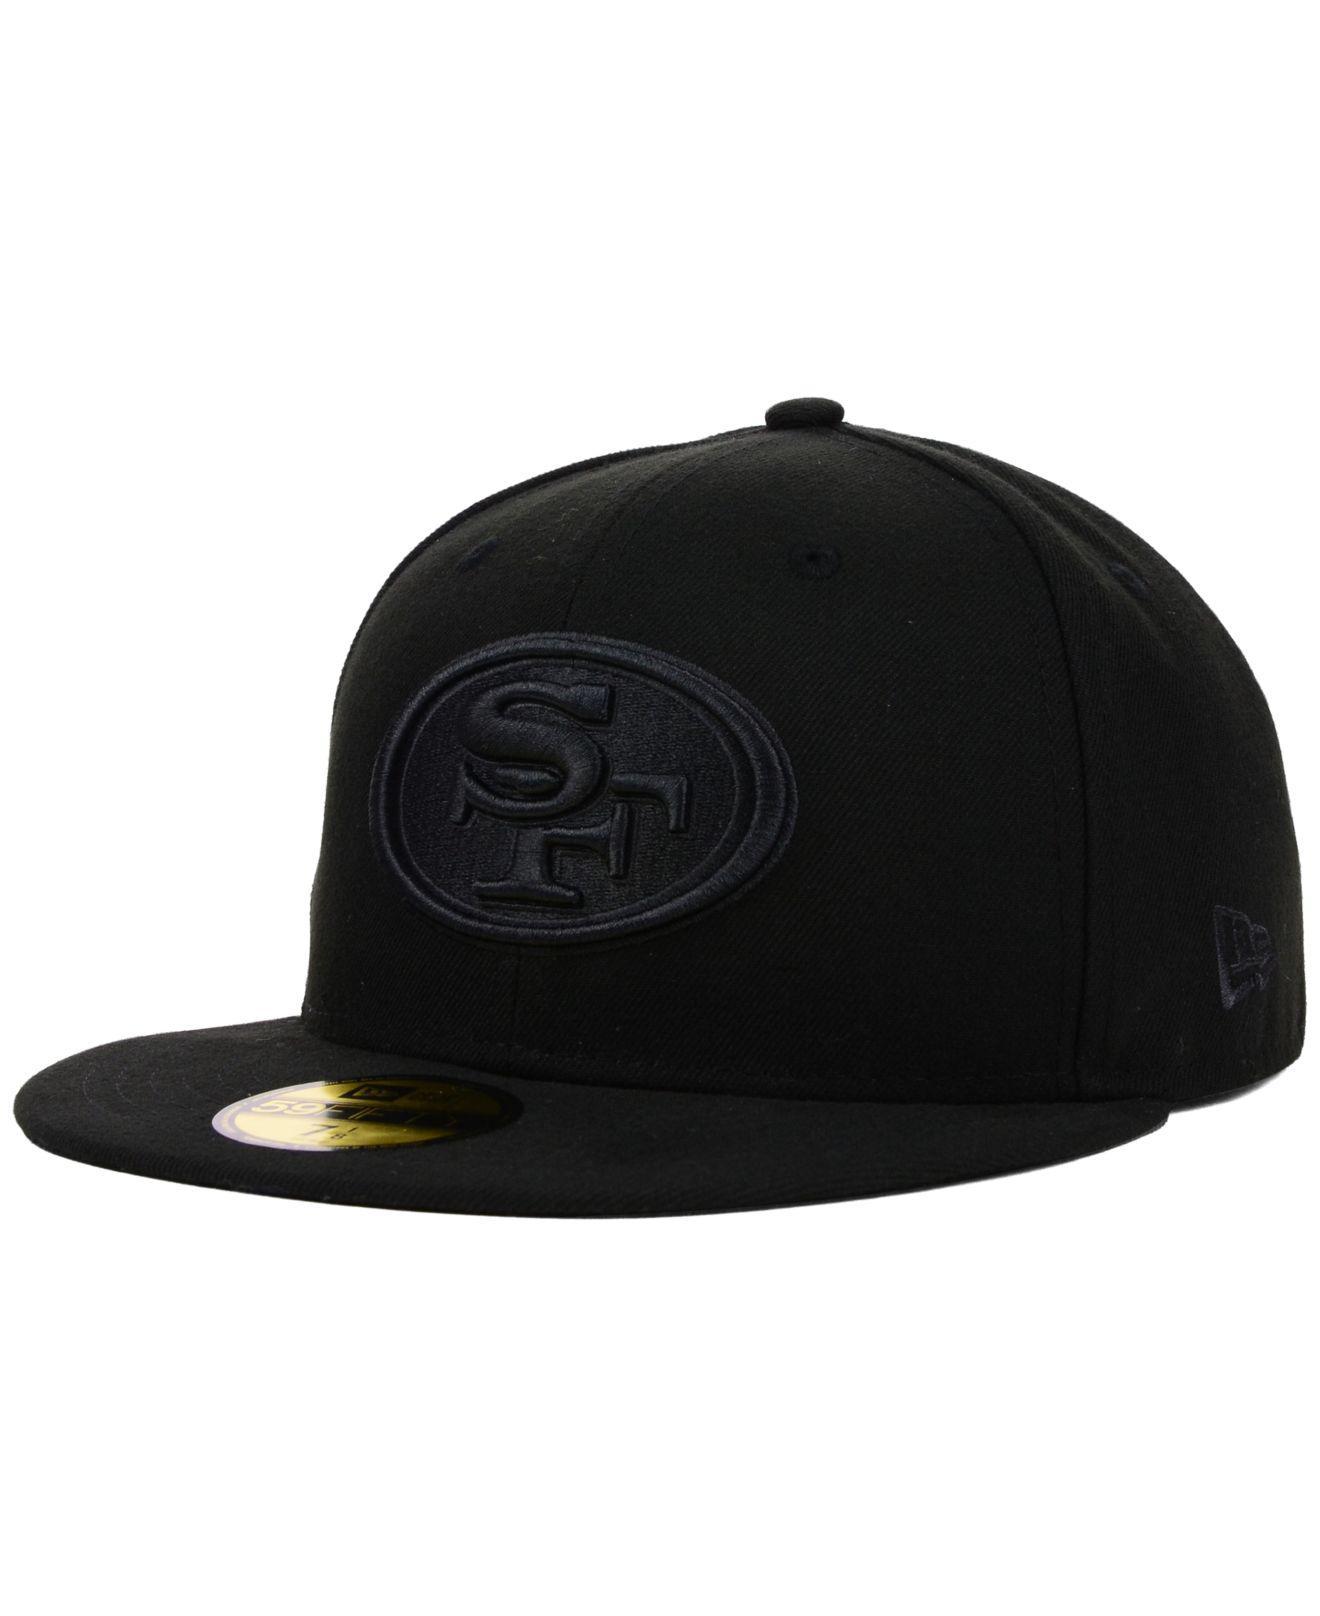 KTZ - San Francisco 49ers Nfl Black On Black 59fifty Cap for Men - Lyst.  View fullscreen 2553e4b38